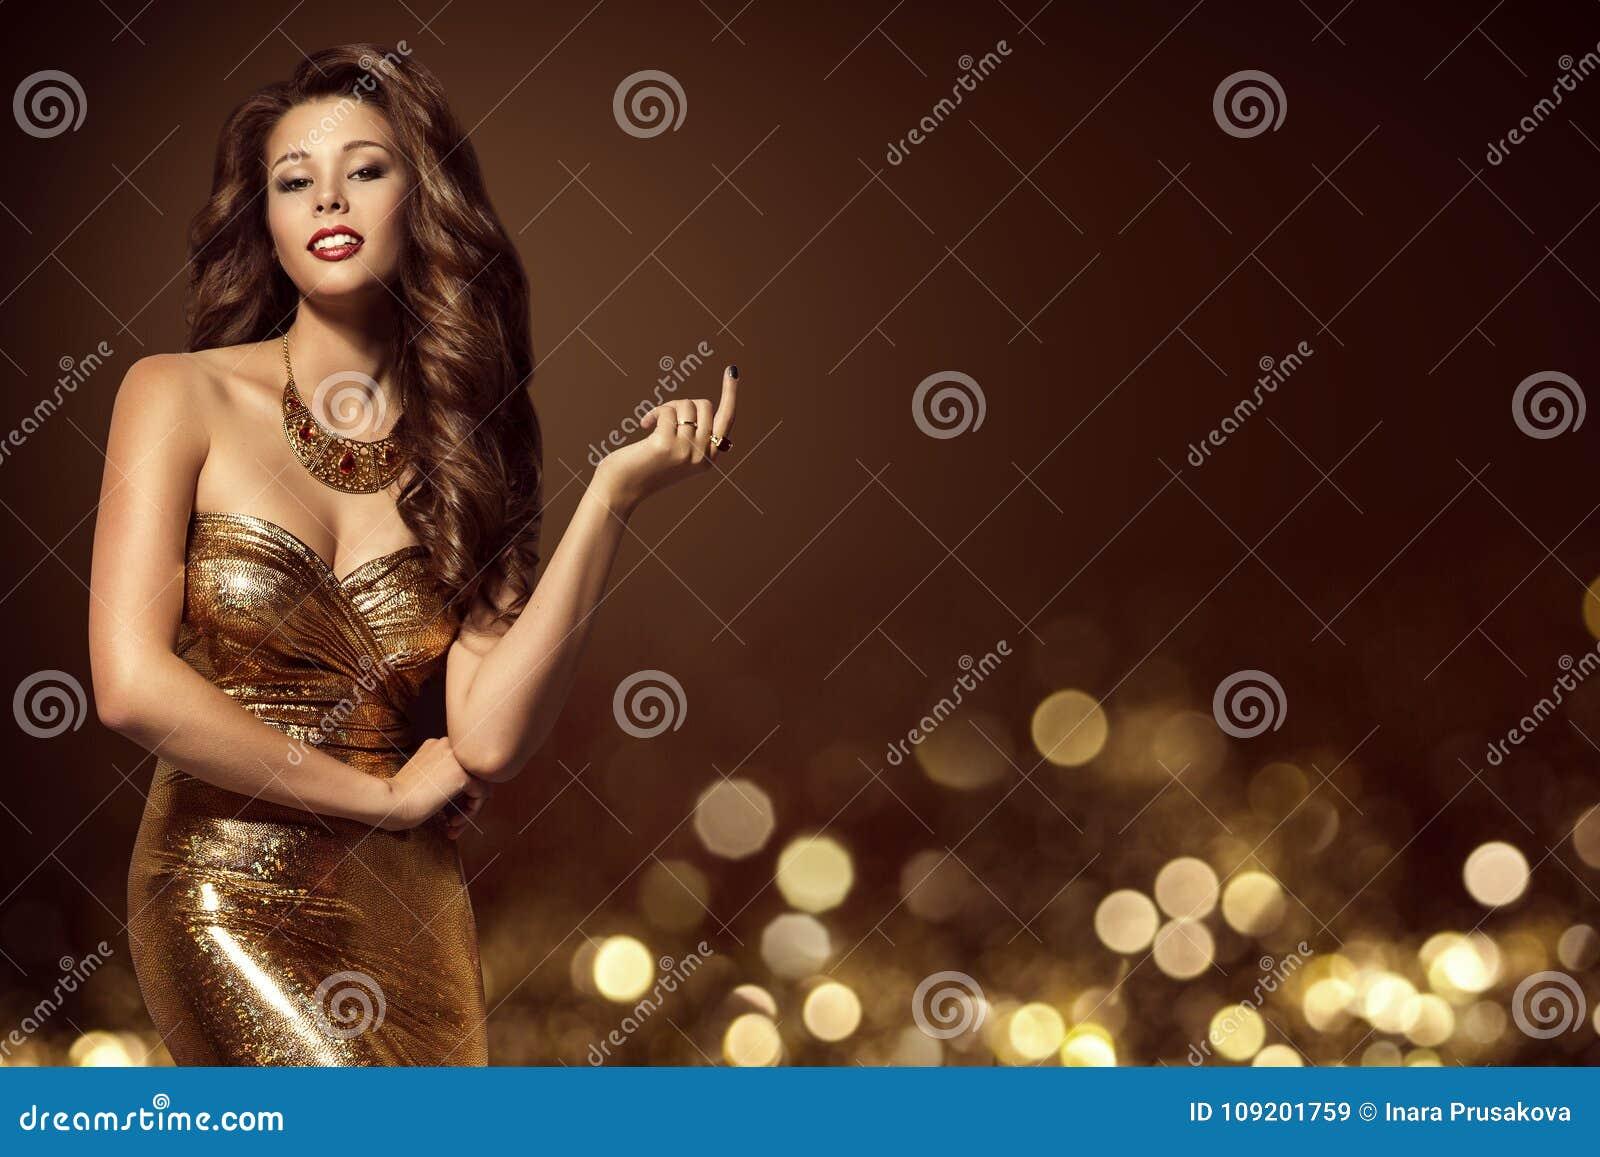 Modelo de moda Gold Dress, mujer joven elegante en vestido de oro